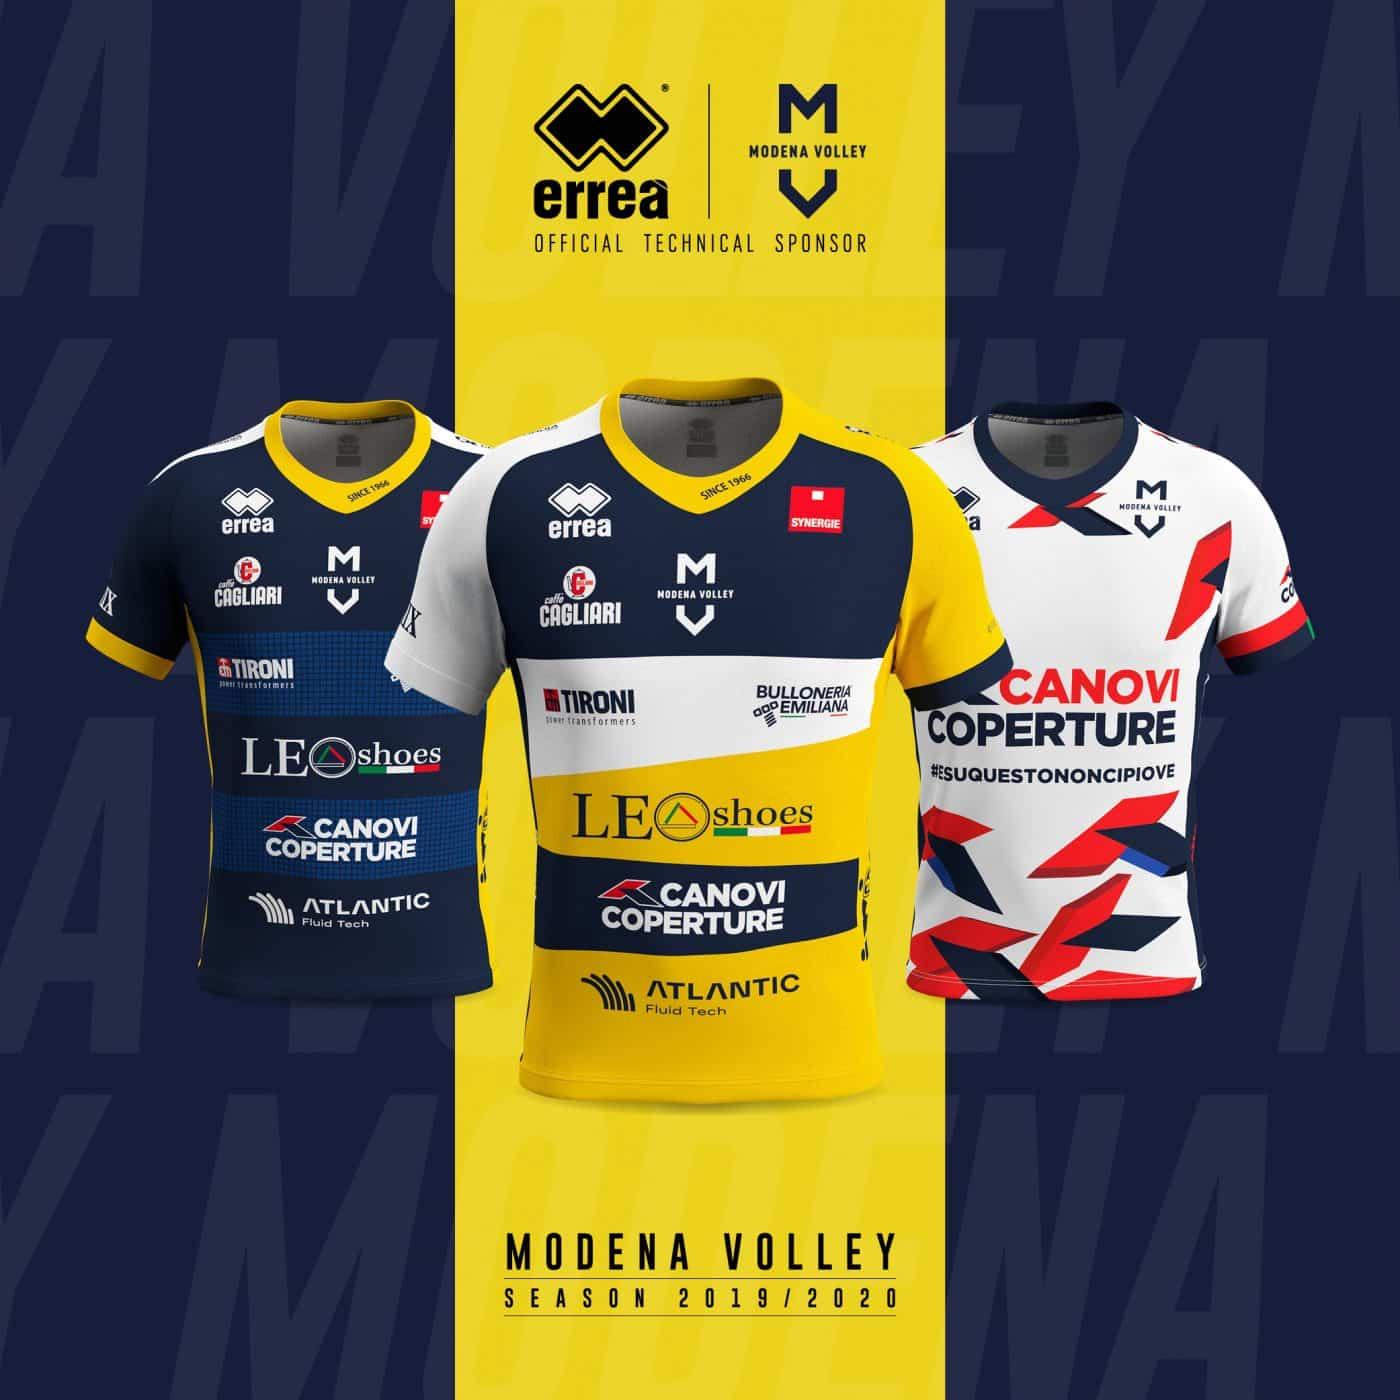 maillot-volley-serie-a-italienne-modena-errea-5